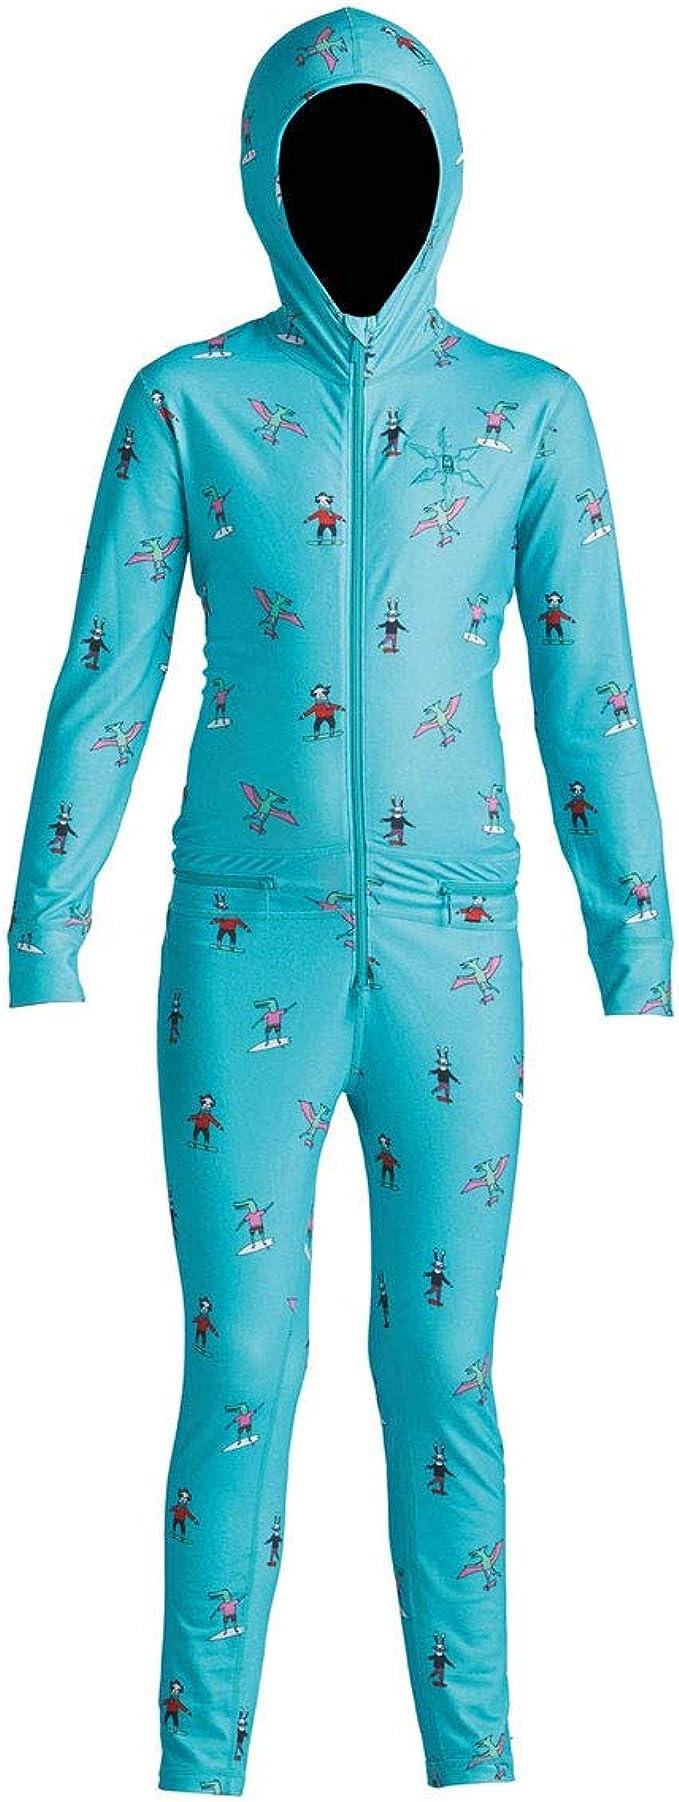 Amazon.com: AIRBLASTER Youth Ninja Suit Hooded Outdoor One ...